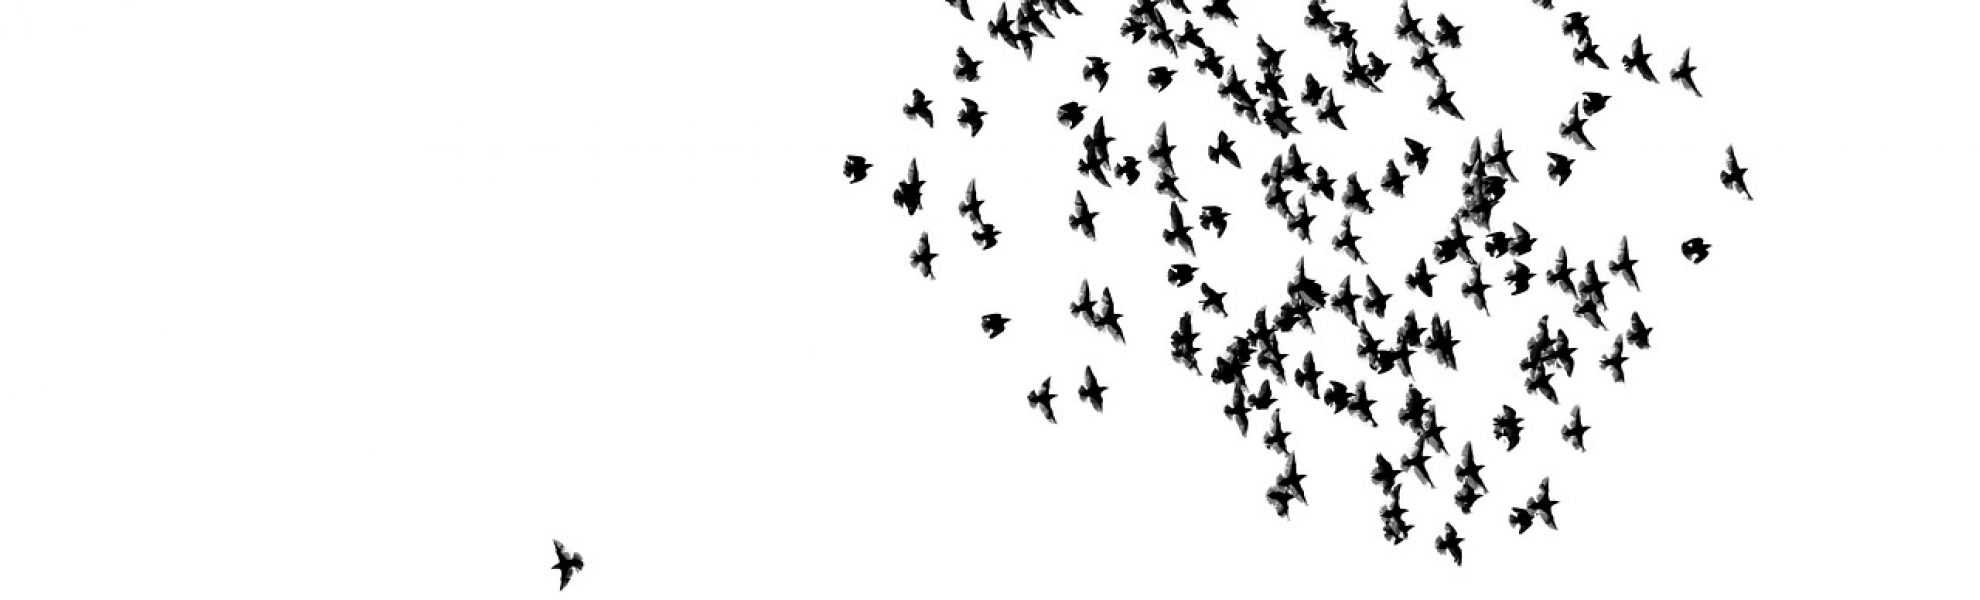 birds-2189476_1280